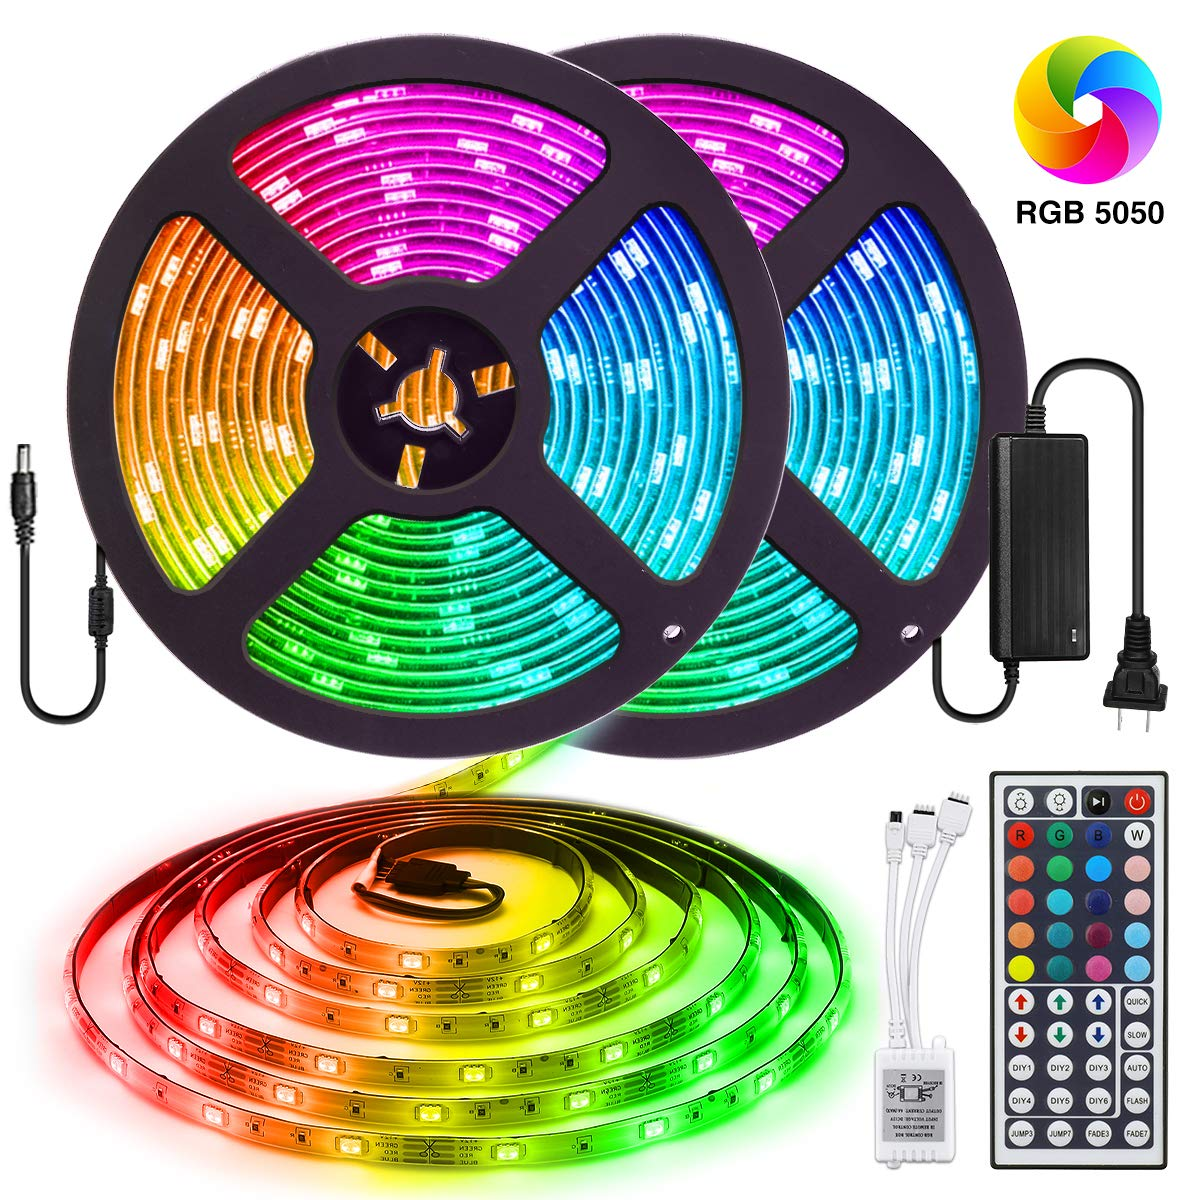 Elfeland LED Strip Lights 32.8FT/10M 300 LEDs SMD5050 RGB Strip Lights IP65 Waterproof Rope Lights Color Changing Flexible Tape Light Kit with 44 Keys IR Remote Controller & 12V 5A Power Supply